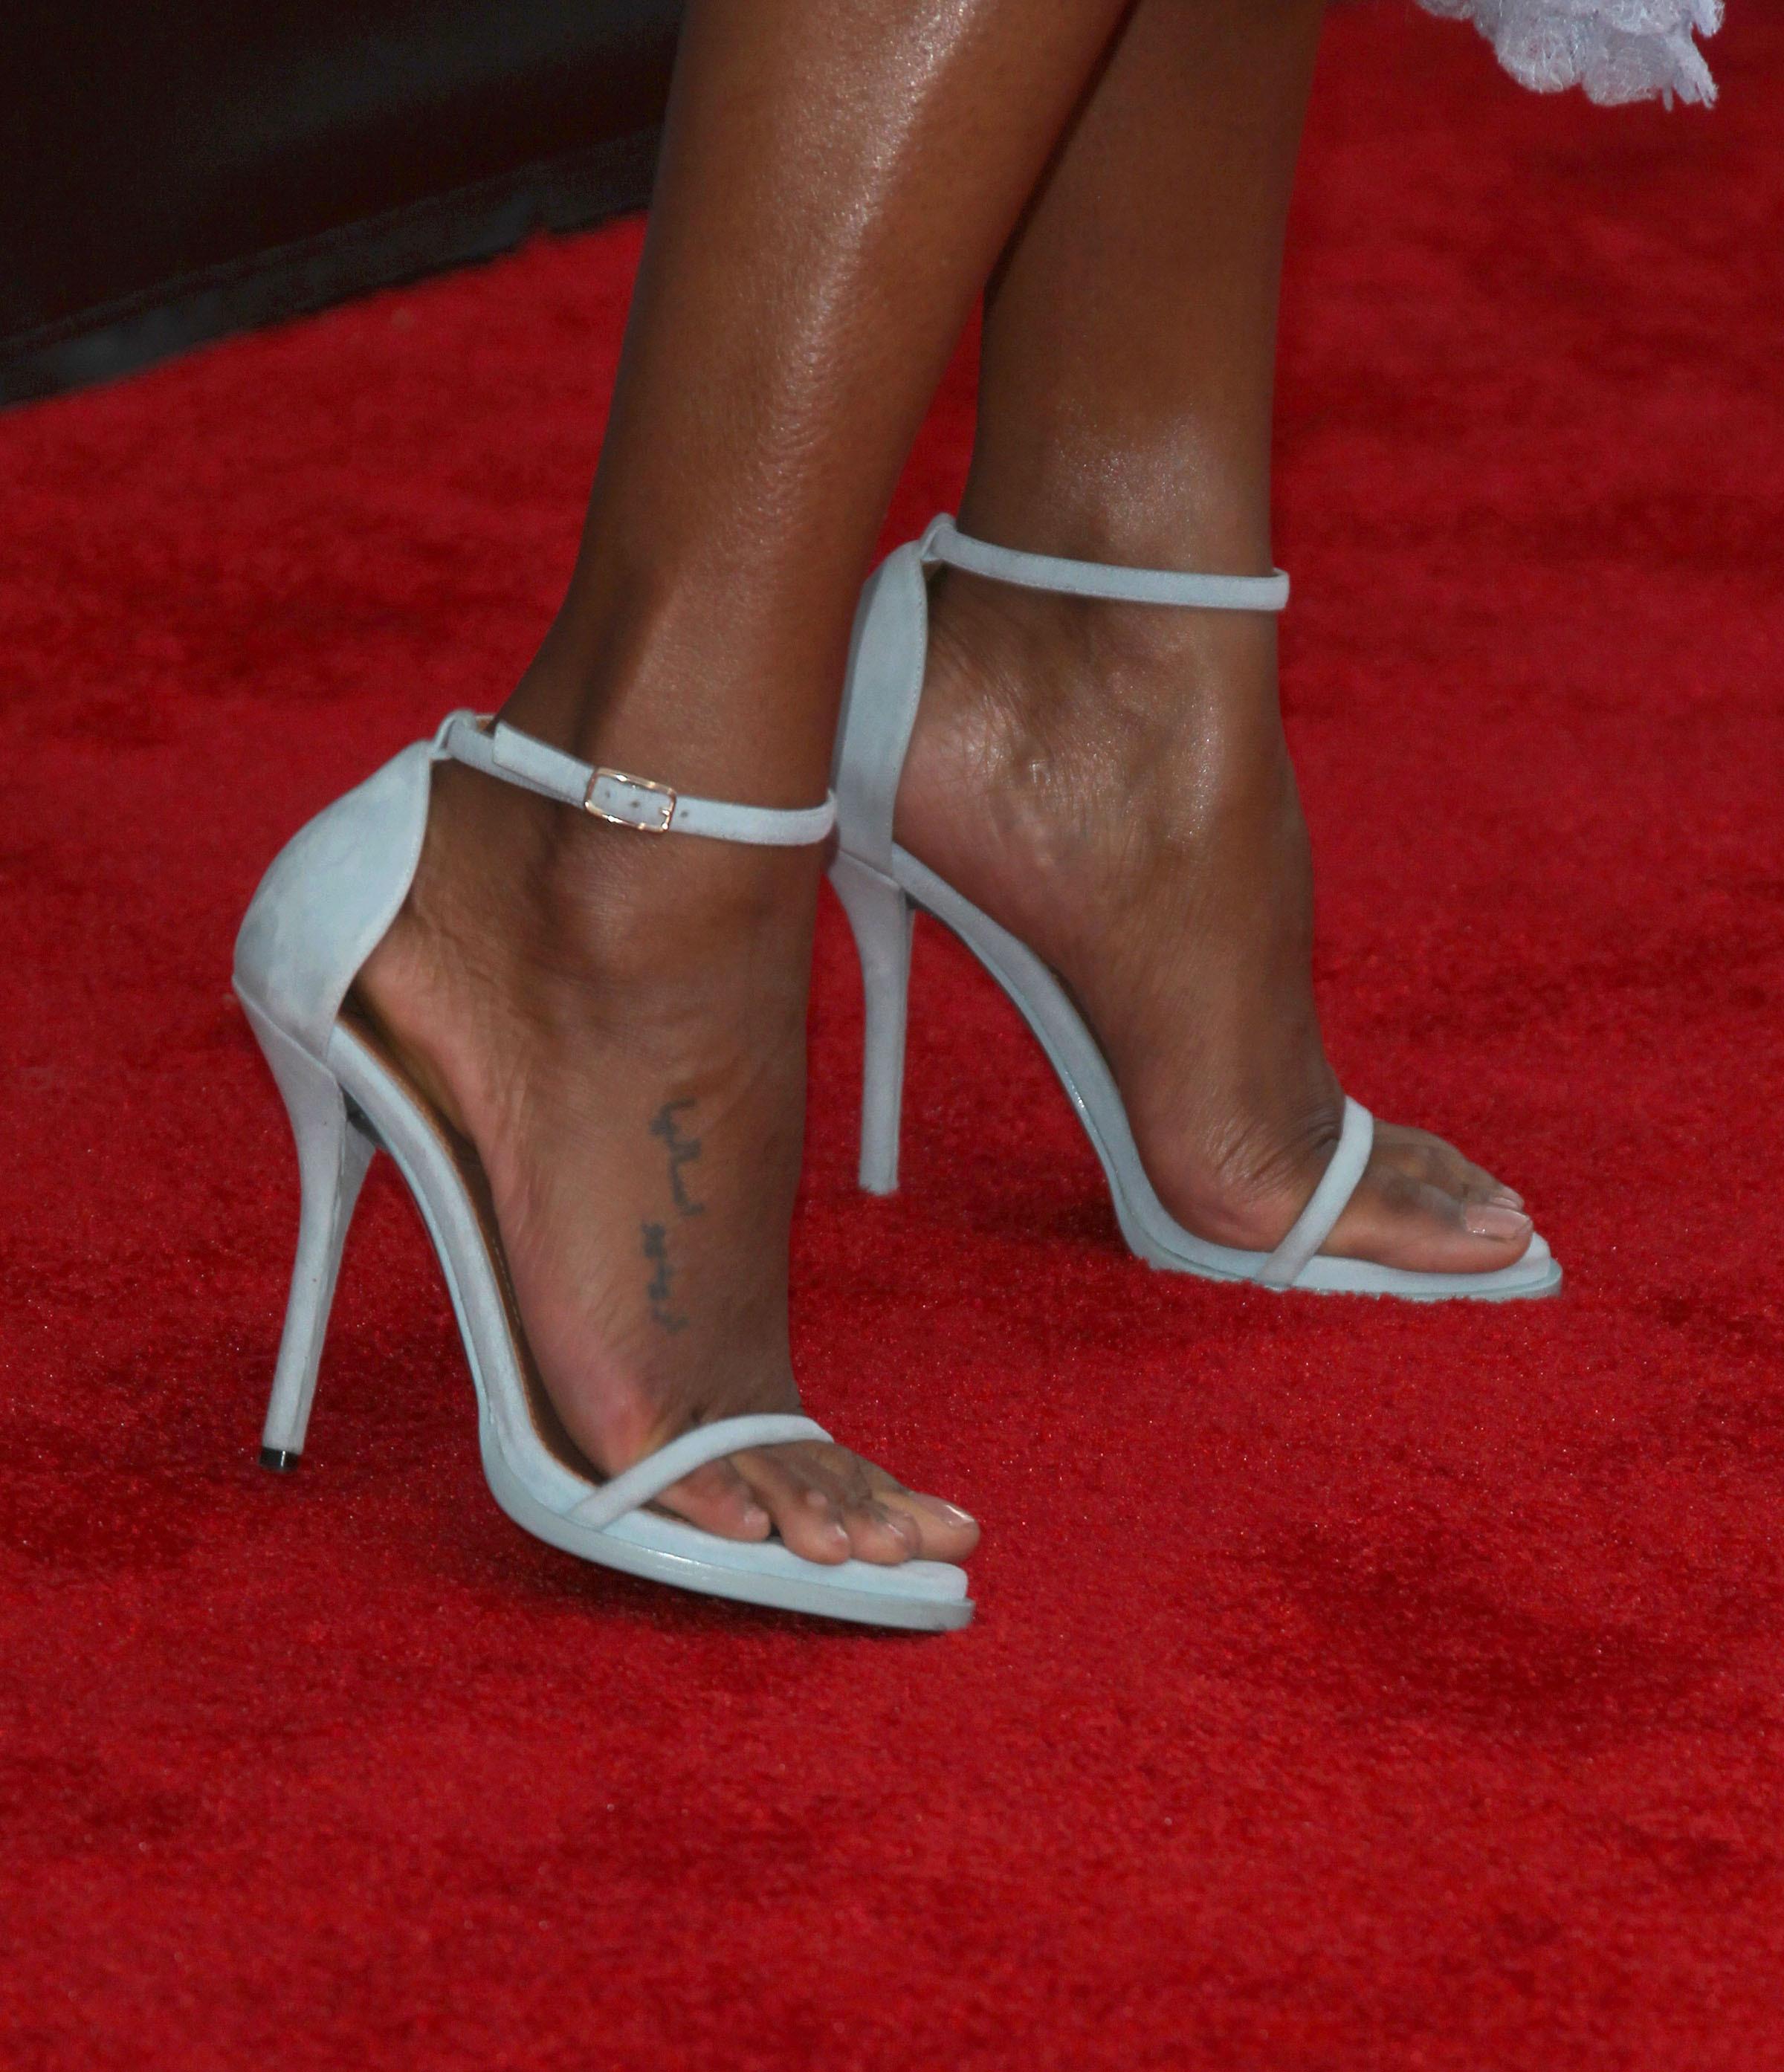 zoe saldana feet